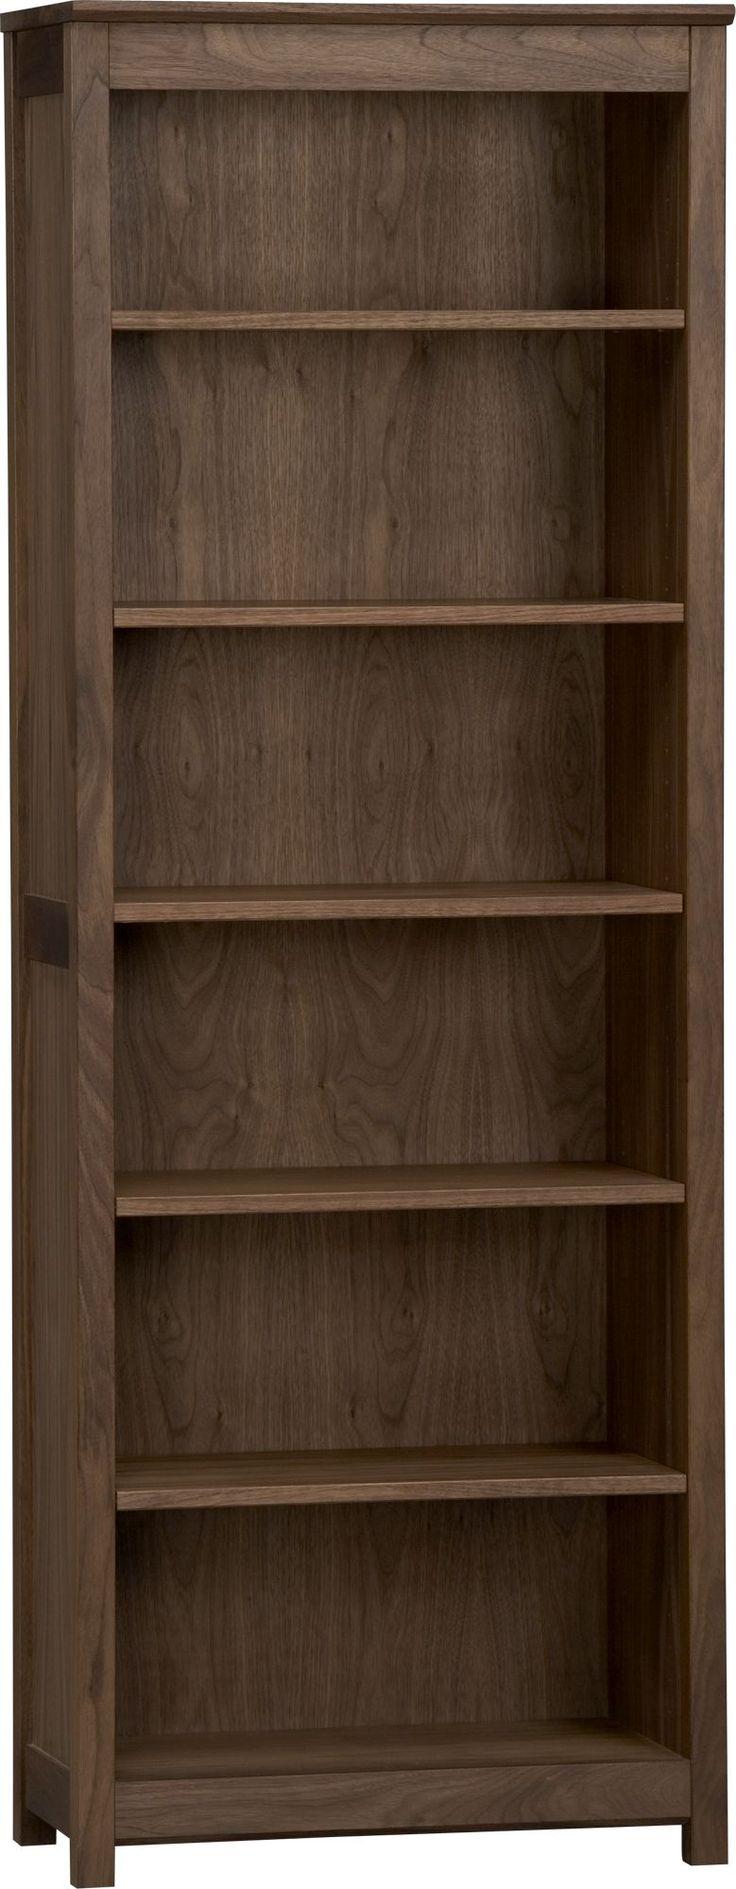 Ainsworth Walnut Bookcase Crate And Barrel